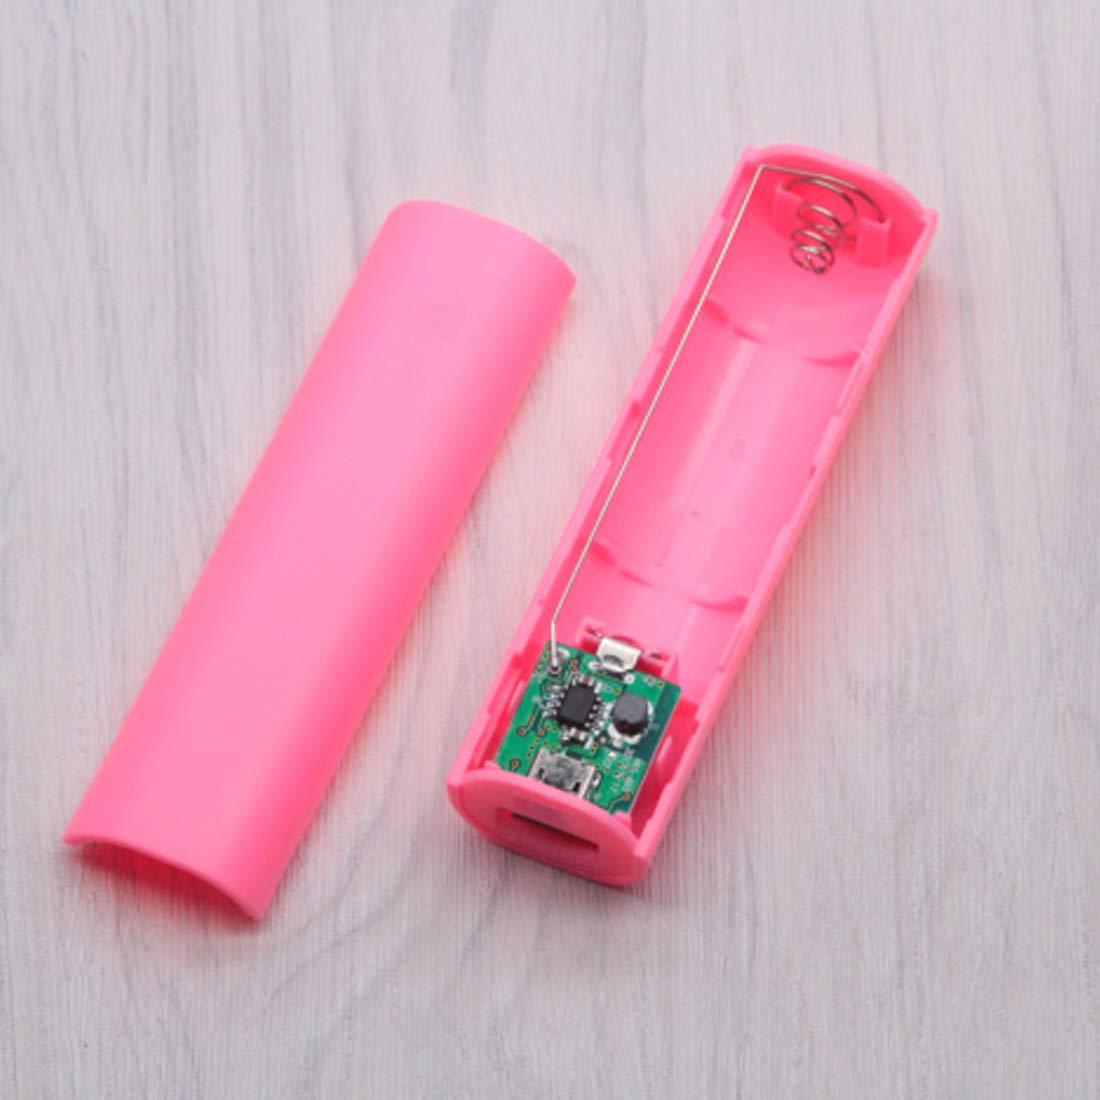 ihen-Tech Mini tragbare 18650 Ladeger/ät DIY USB Mobile Power Bank Pack Box Batterie Fall f/ür 1 x 18650